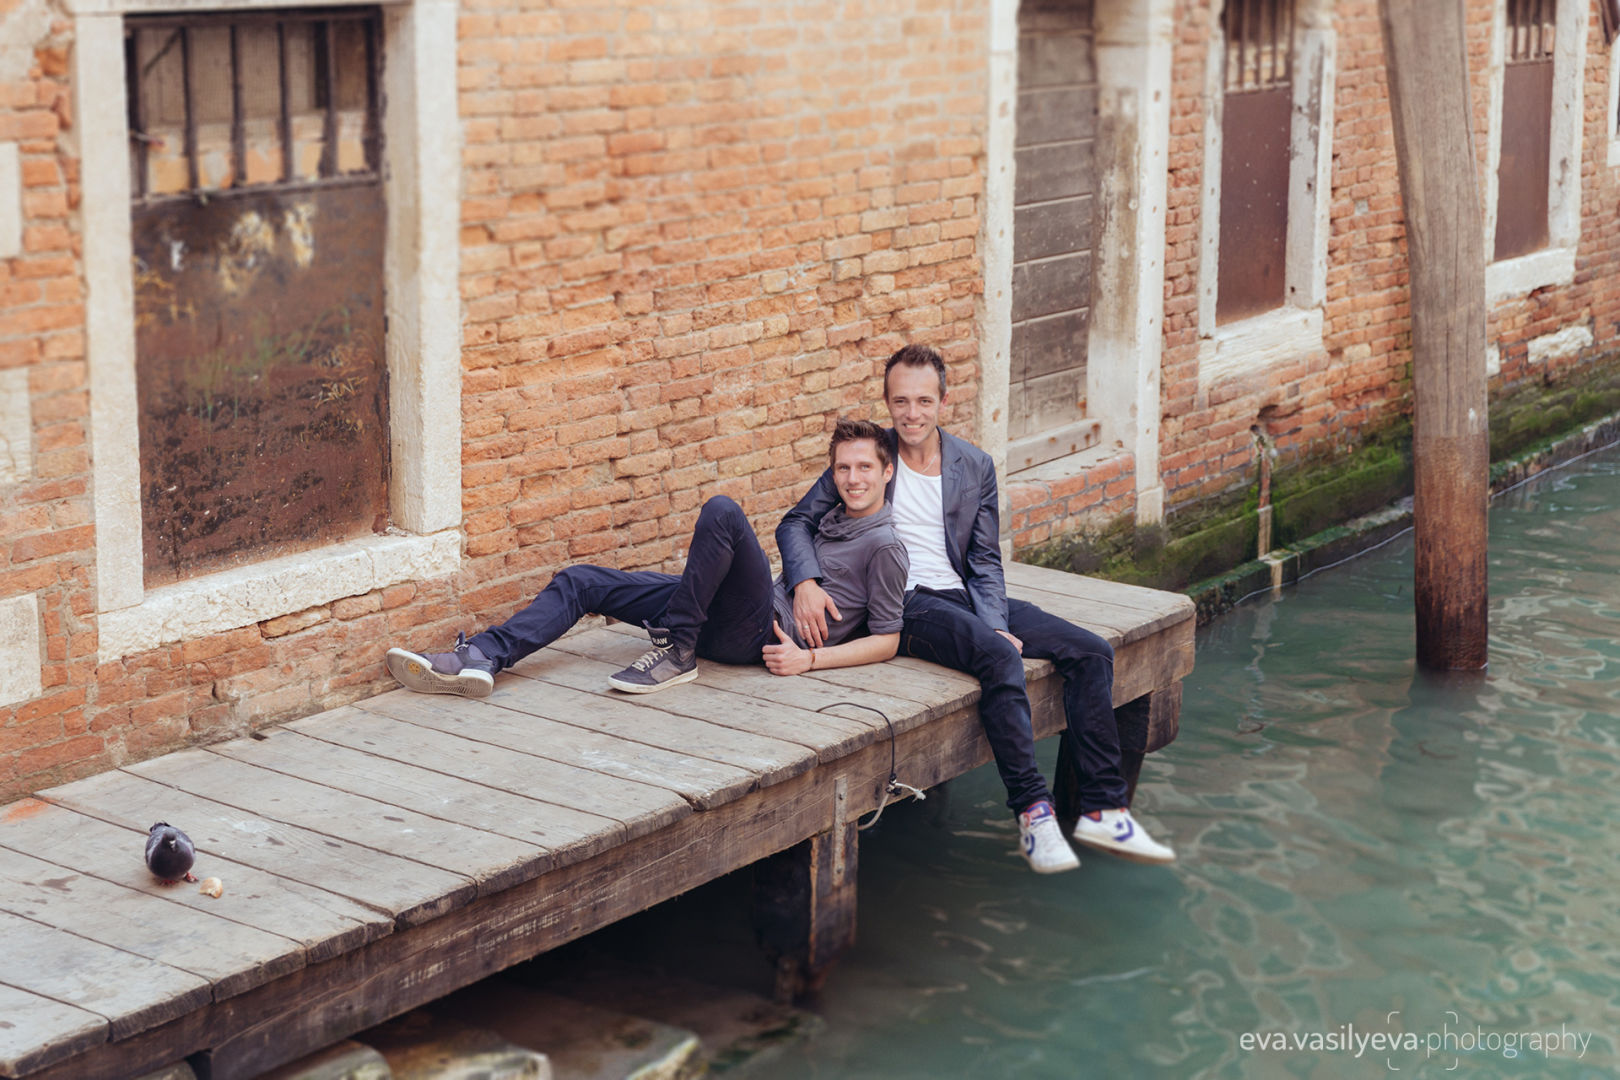 Venice_2015-05-05_077_retouch_logo